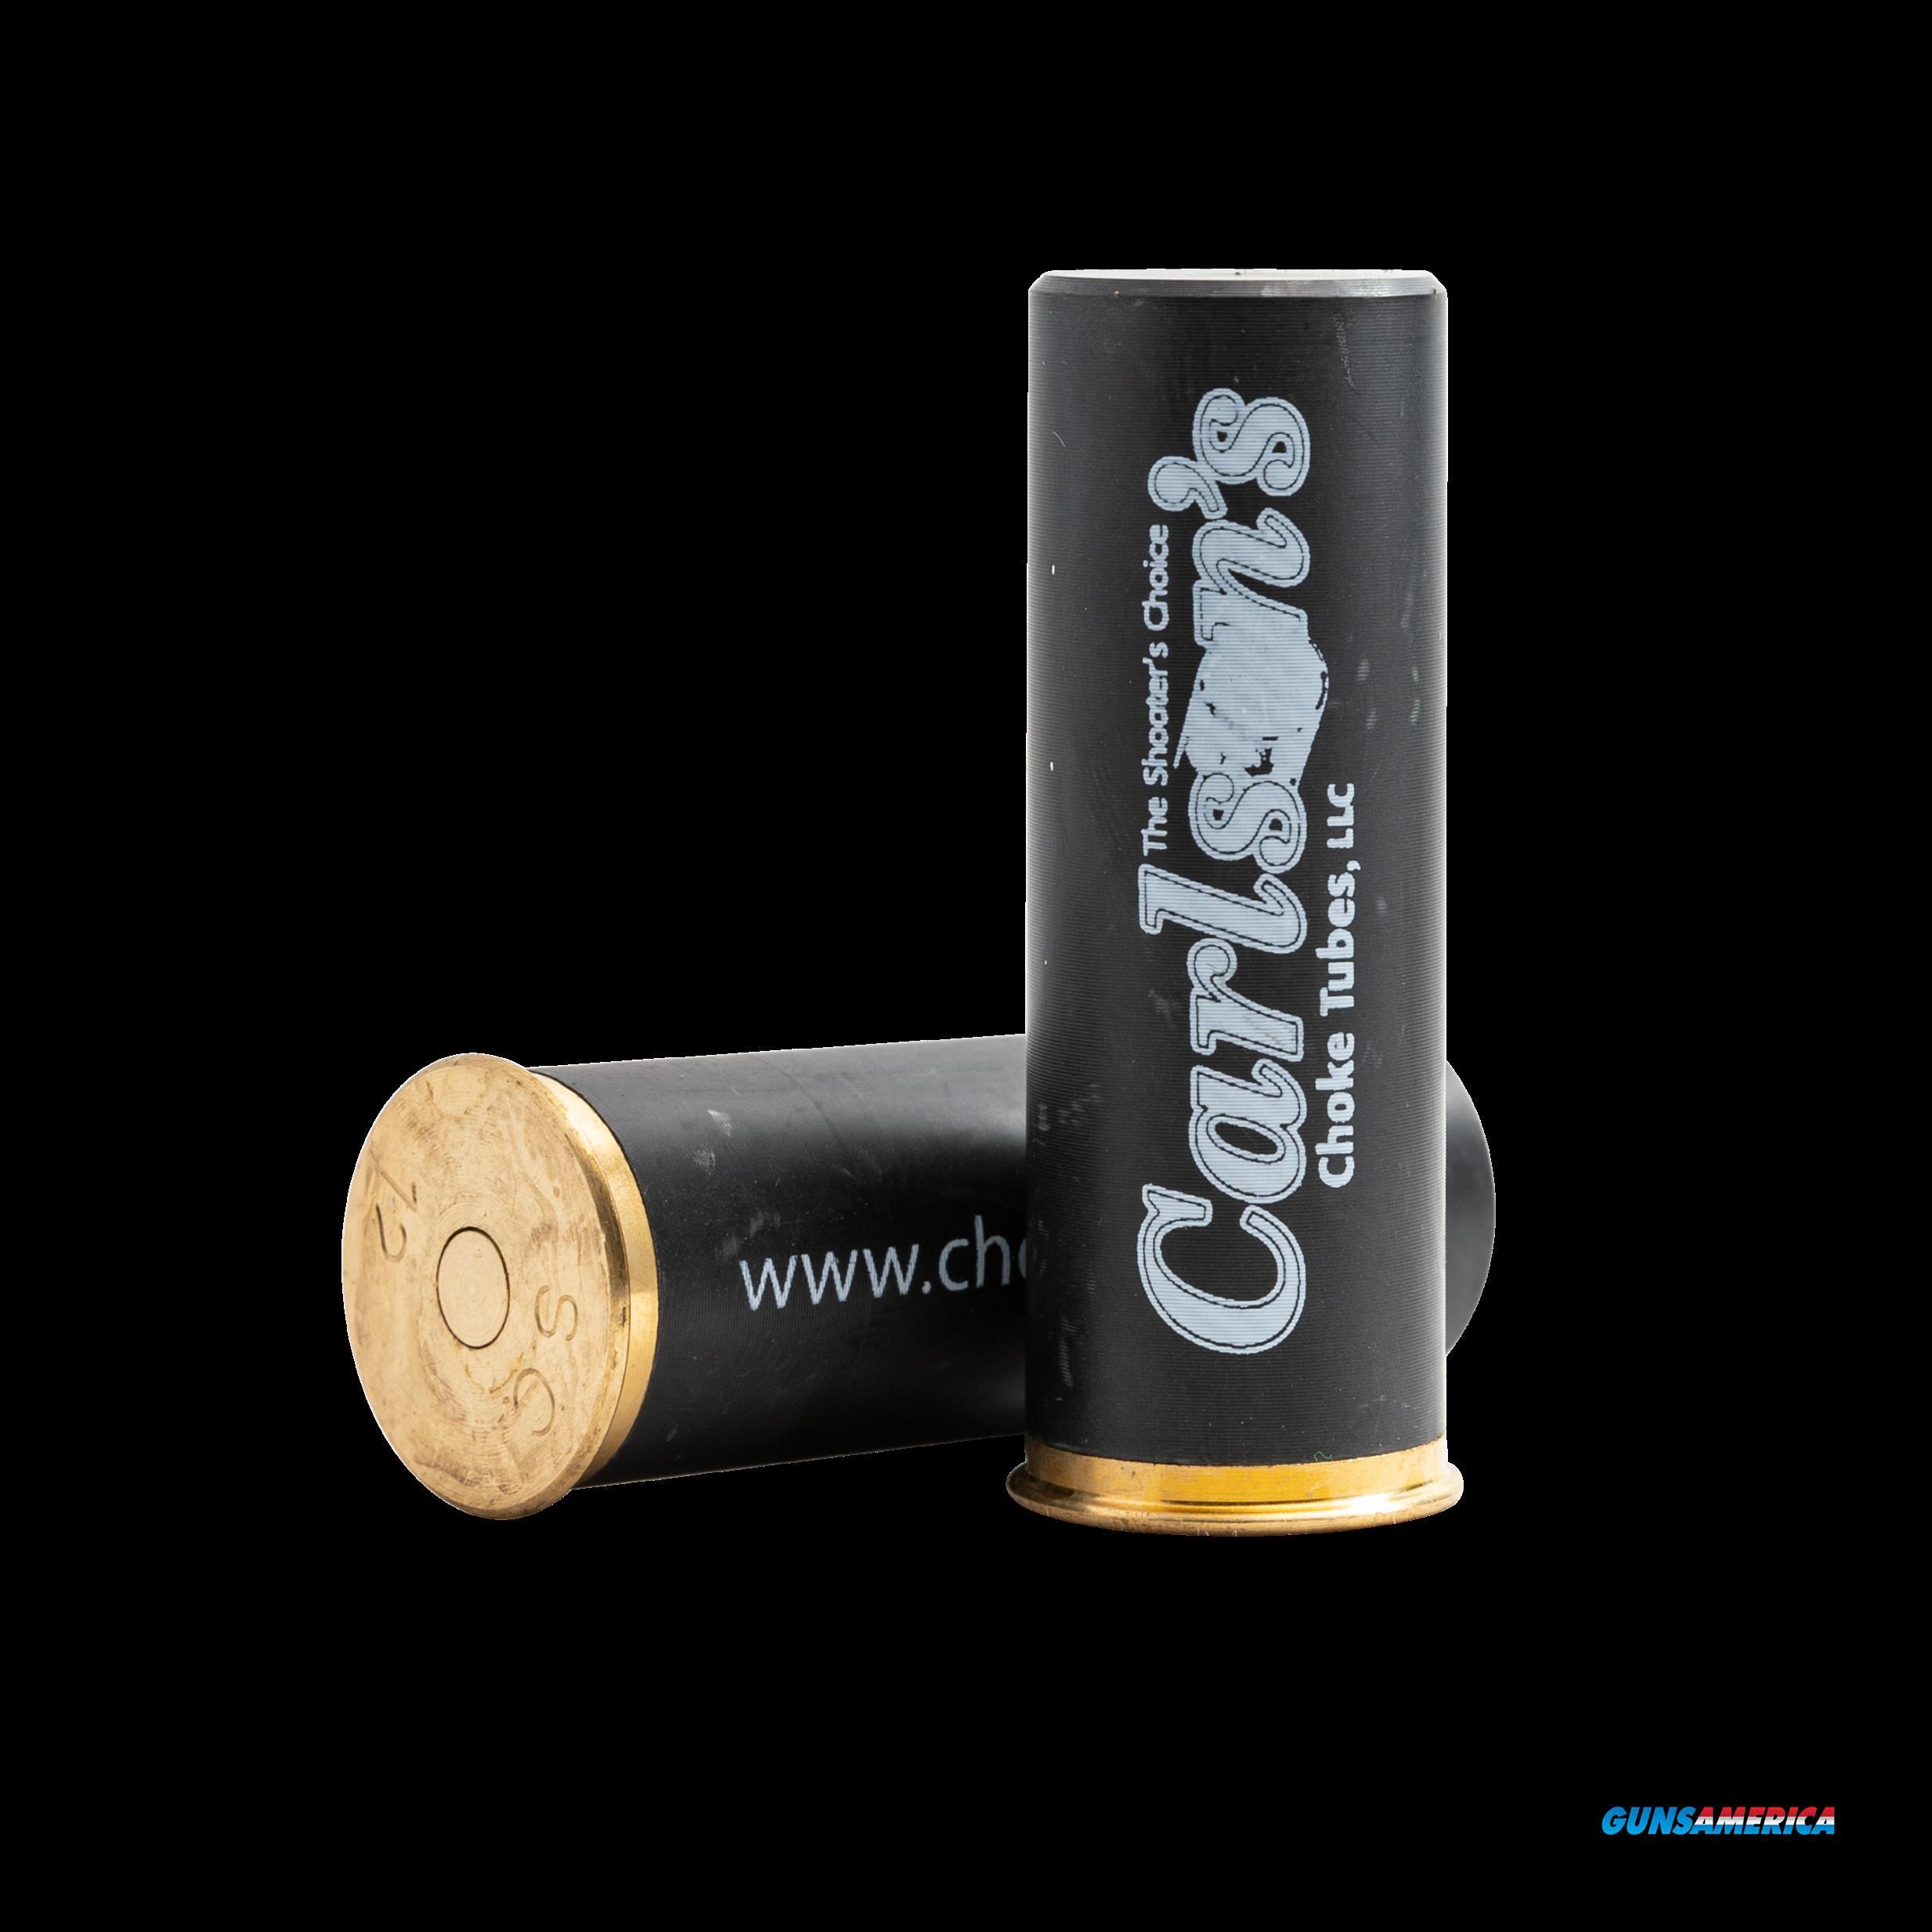 Carlsons Snap Cap, Carl 00103 Snap Cap: 12ga Dummy Shell  (2 Pack)  Guns > Pistols > 1911 Pistol Copies (non-Colt)